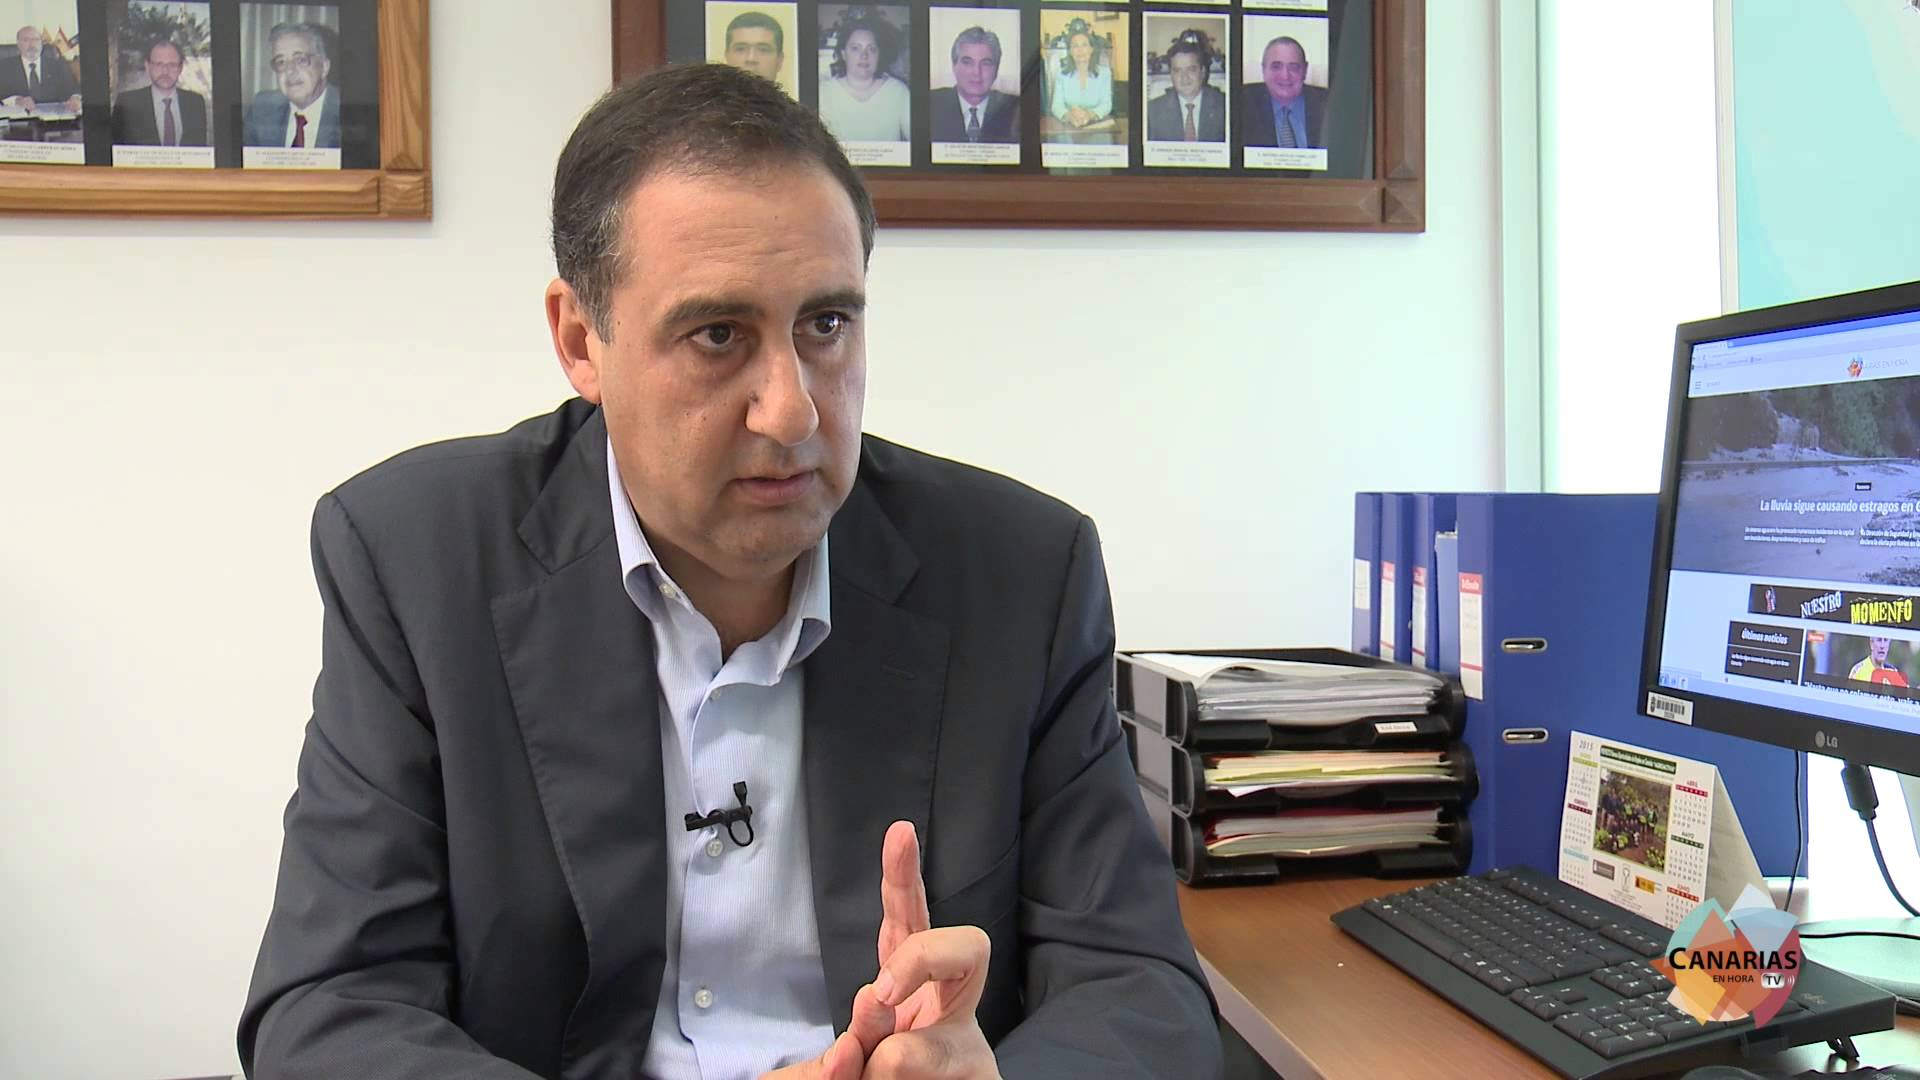 Felipe Afonso El Jaber